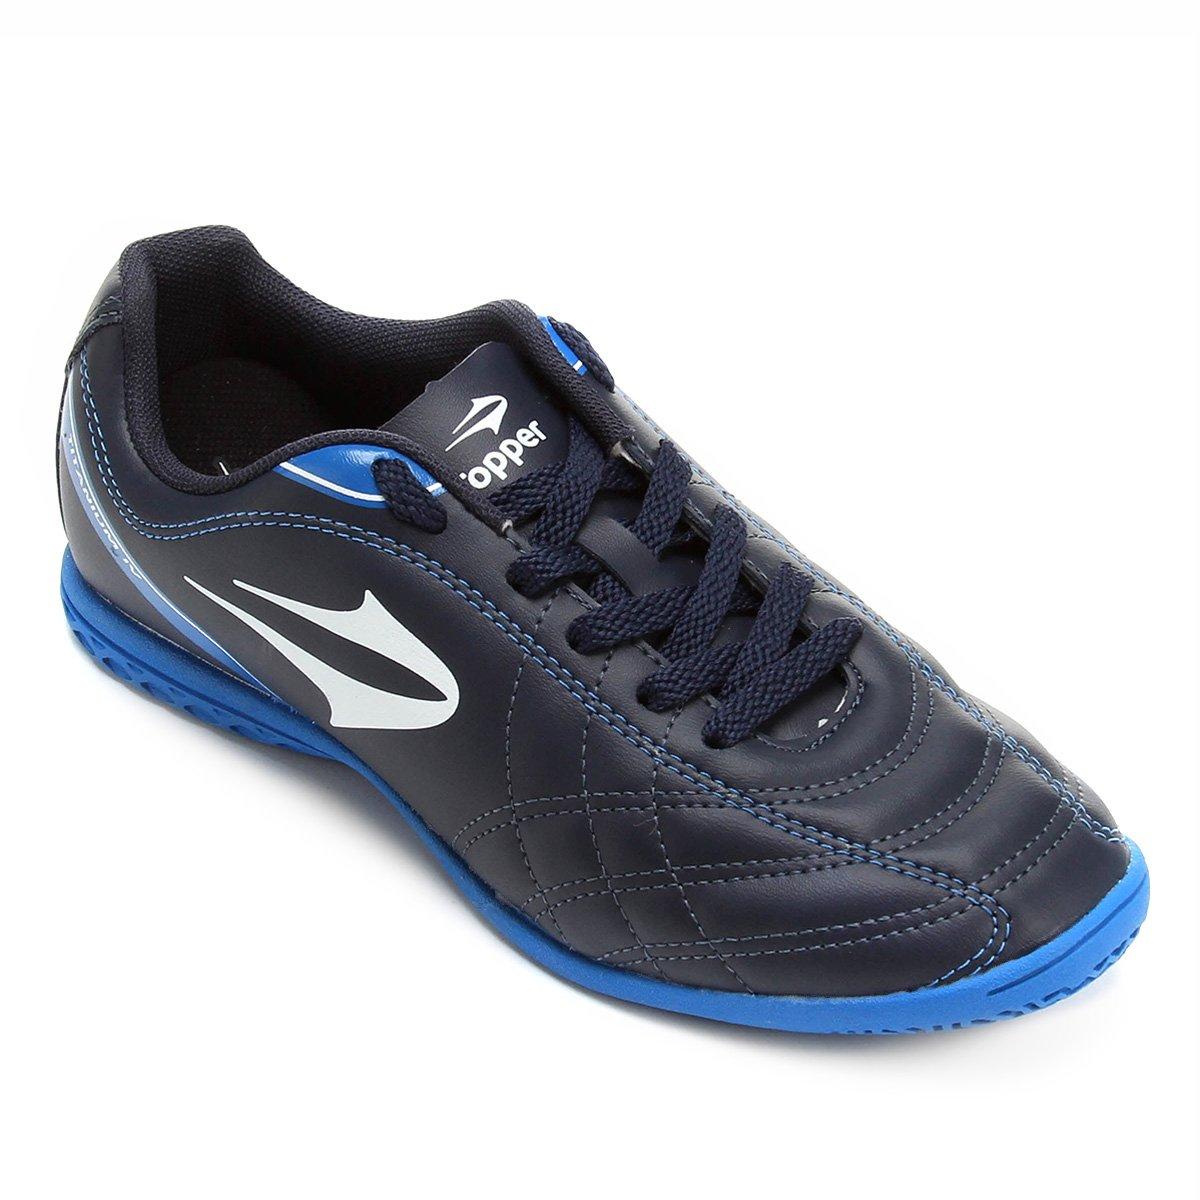 a5bd52d60db9f Chuteira Futsal Topper Titanium 4 Masculina - Compre Agora